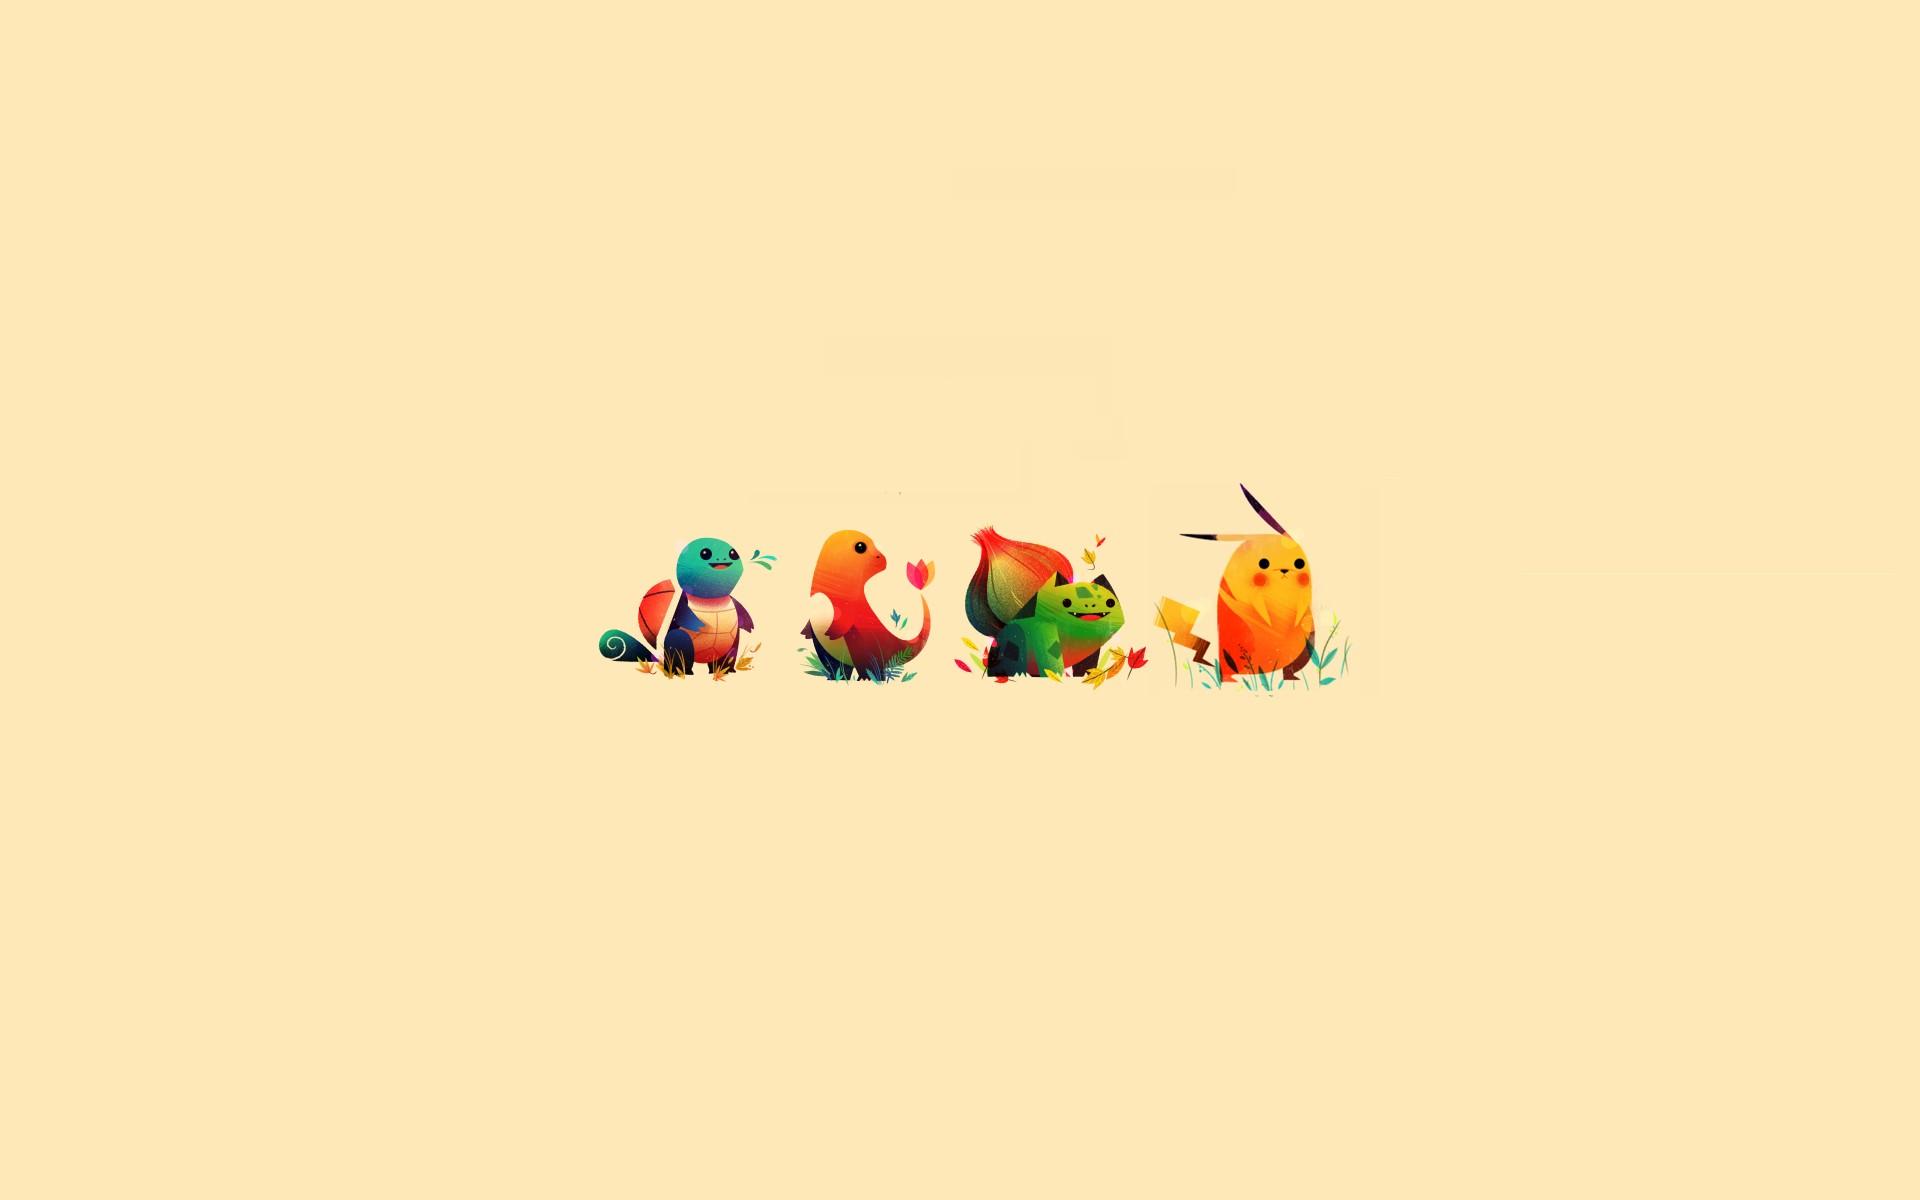 cute pokemon wallpaper 183�� download free cool hd wallpapers